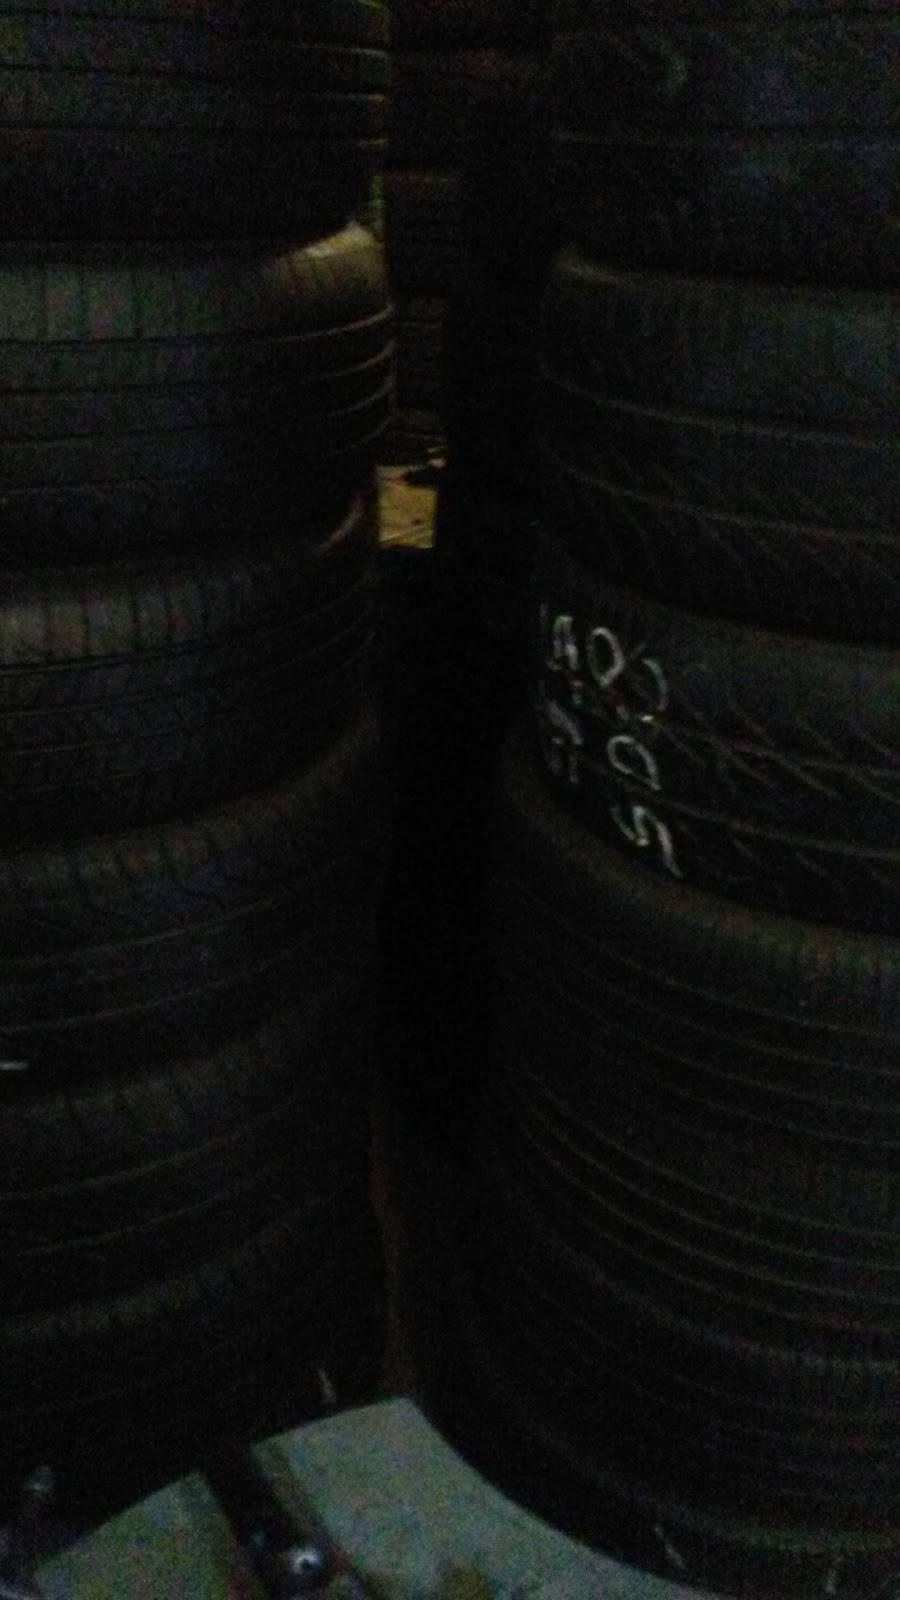 Singletons Battery Co - car repair  | Photo 7 of 10 | Address: 2804 Jacksboro Hwy, Fort Worth, TX 76114, USA | Phone: (817) 626-3326